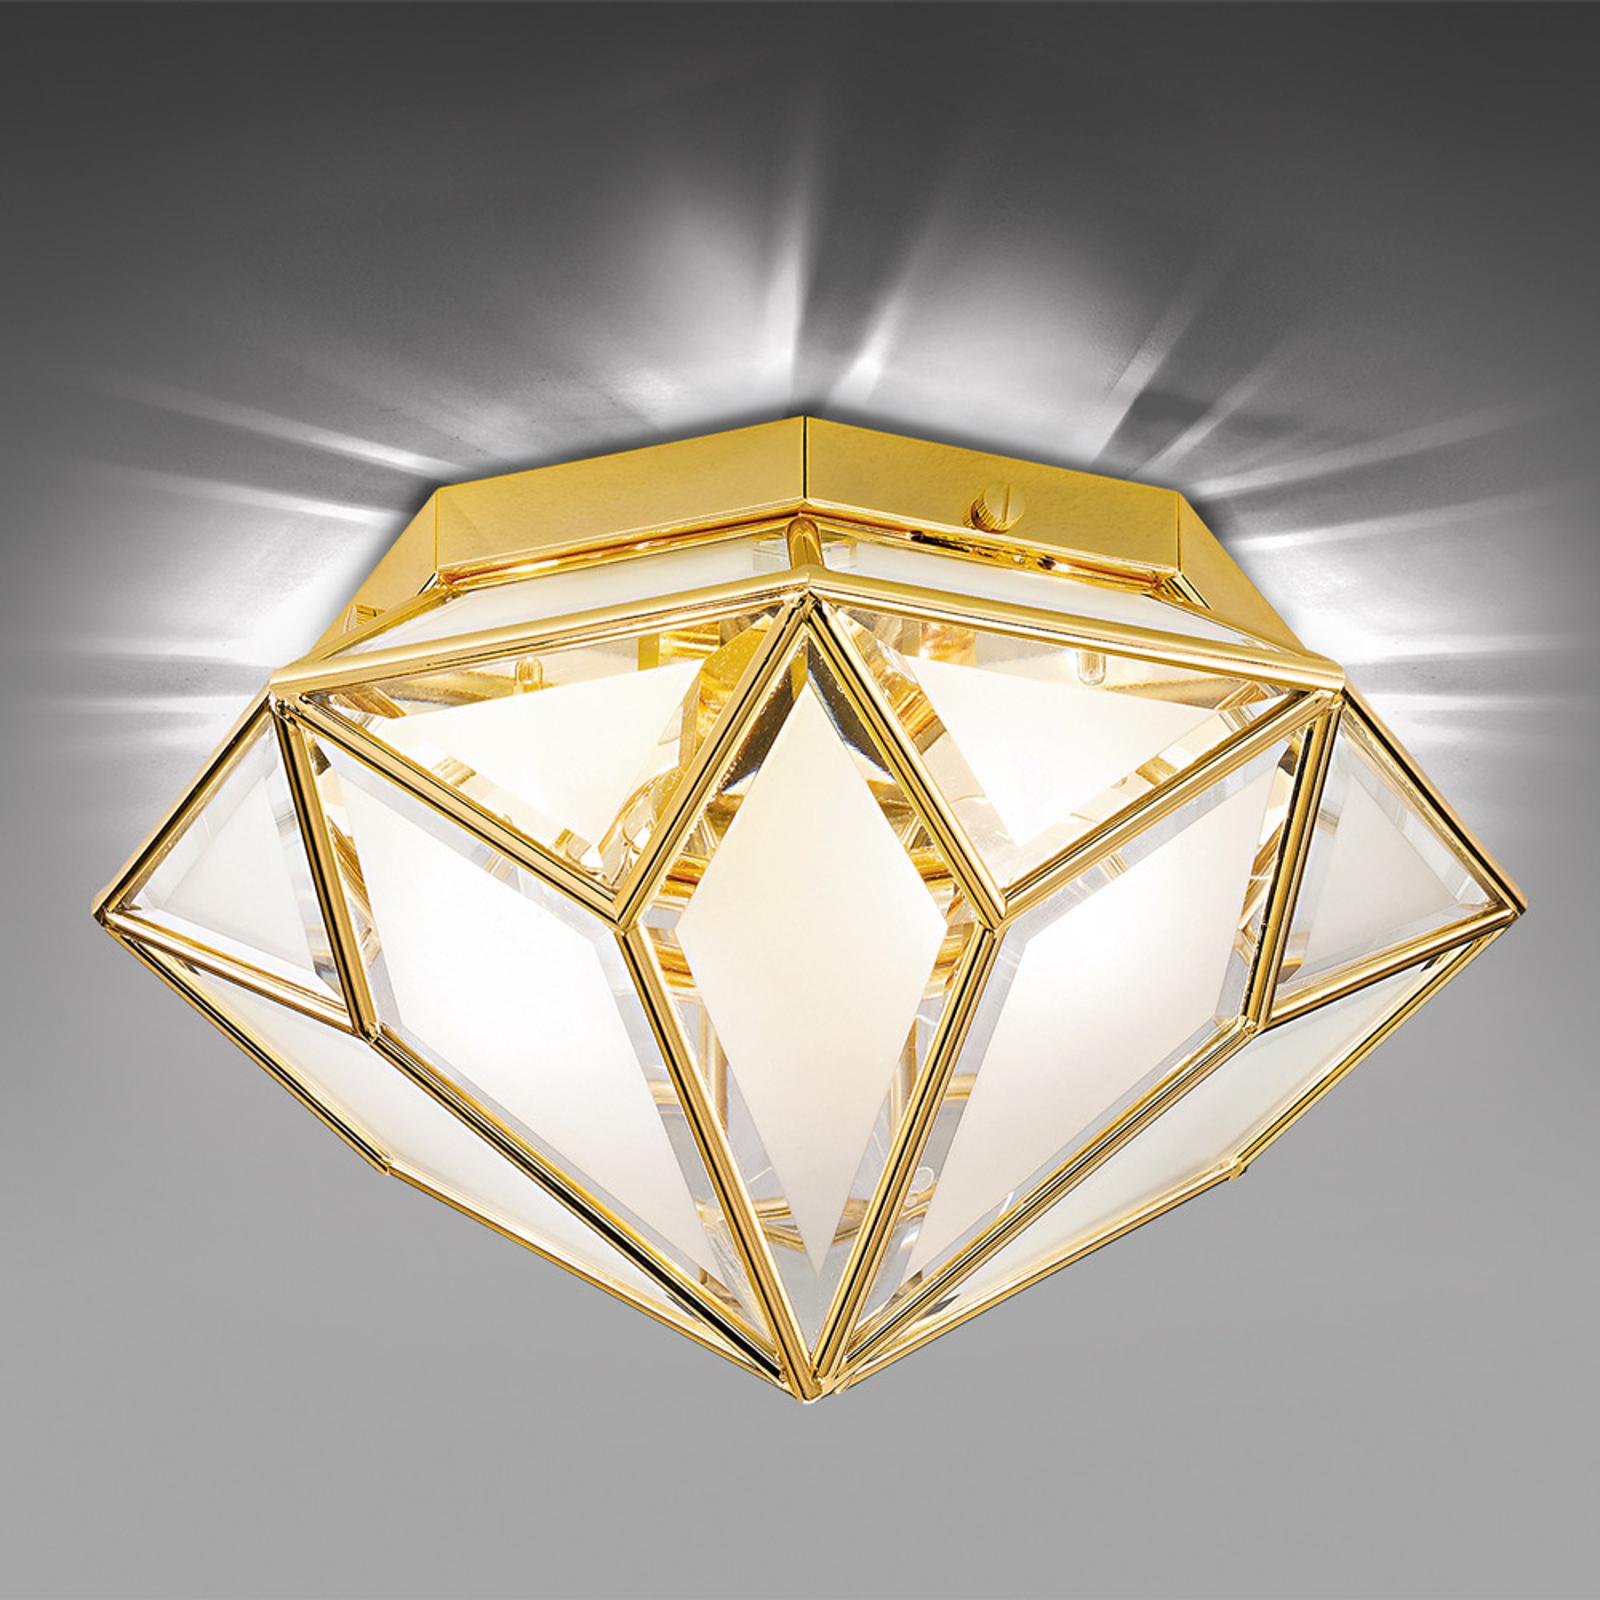 Glansfull taklampa Oro, 2-lågig